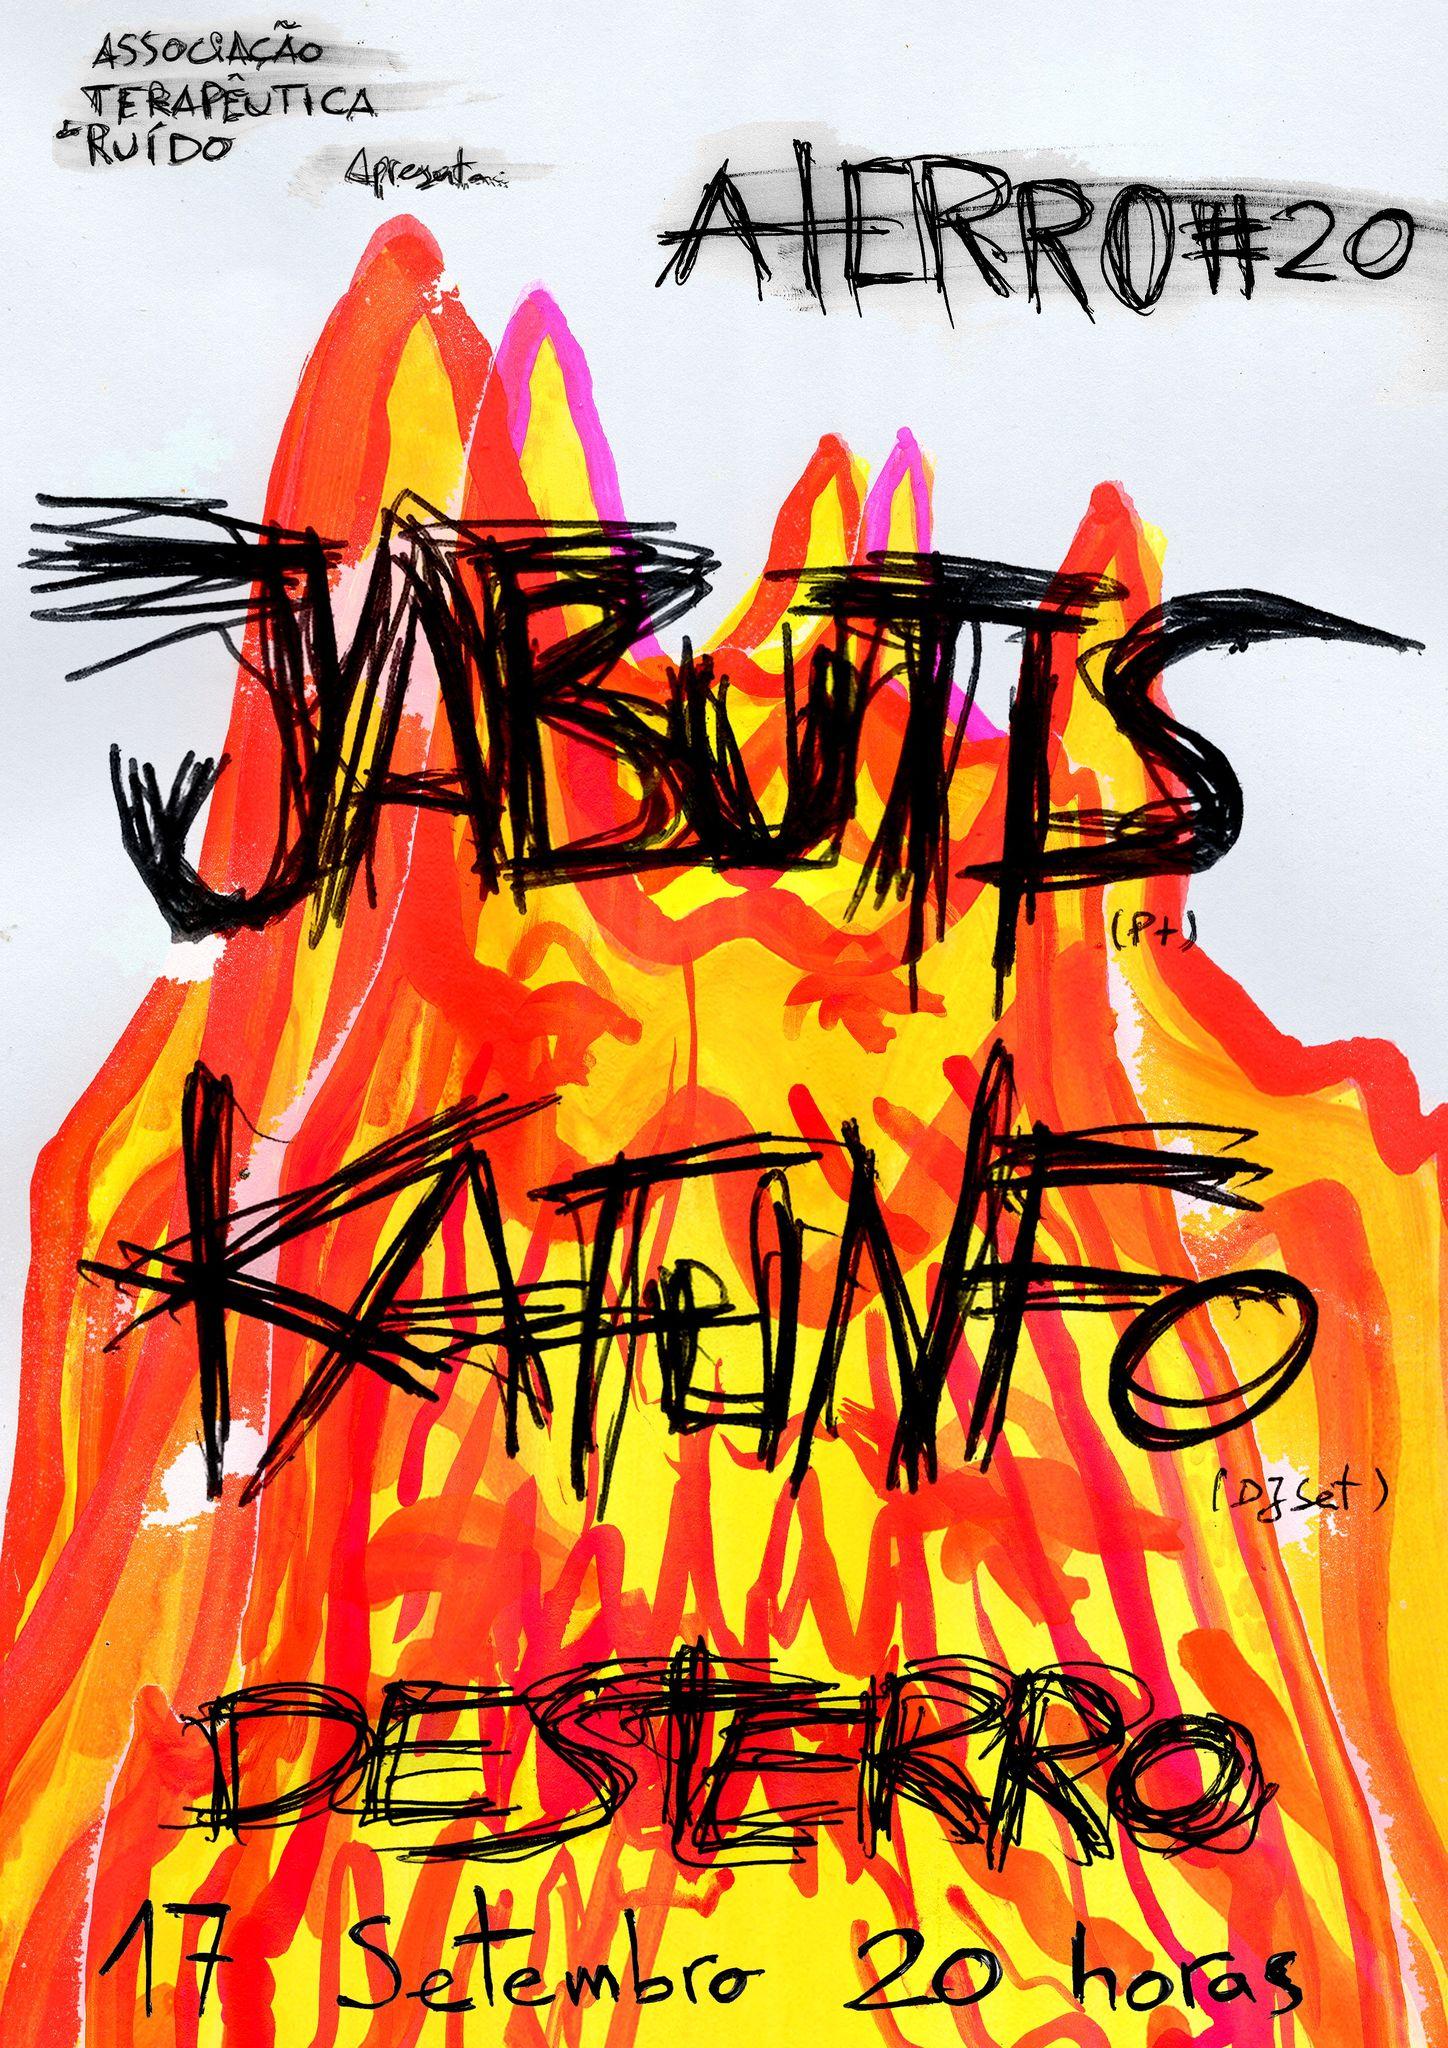 Aterro #20: Jabutis + Kafunfo noSoundsystem